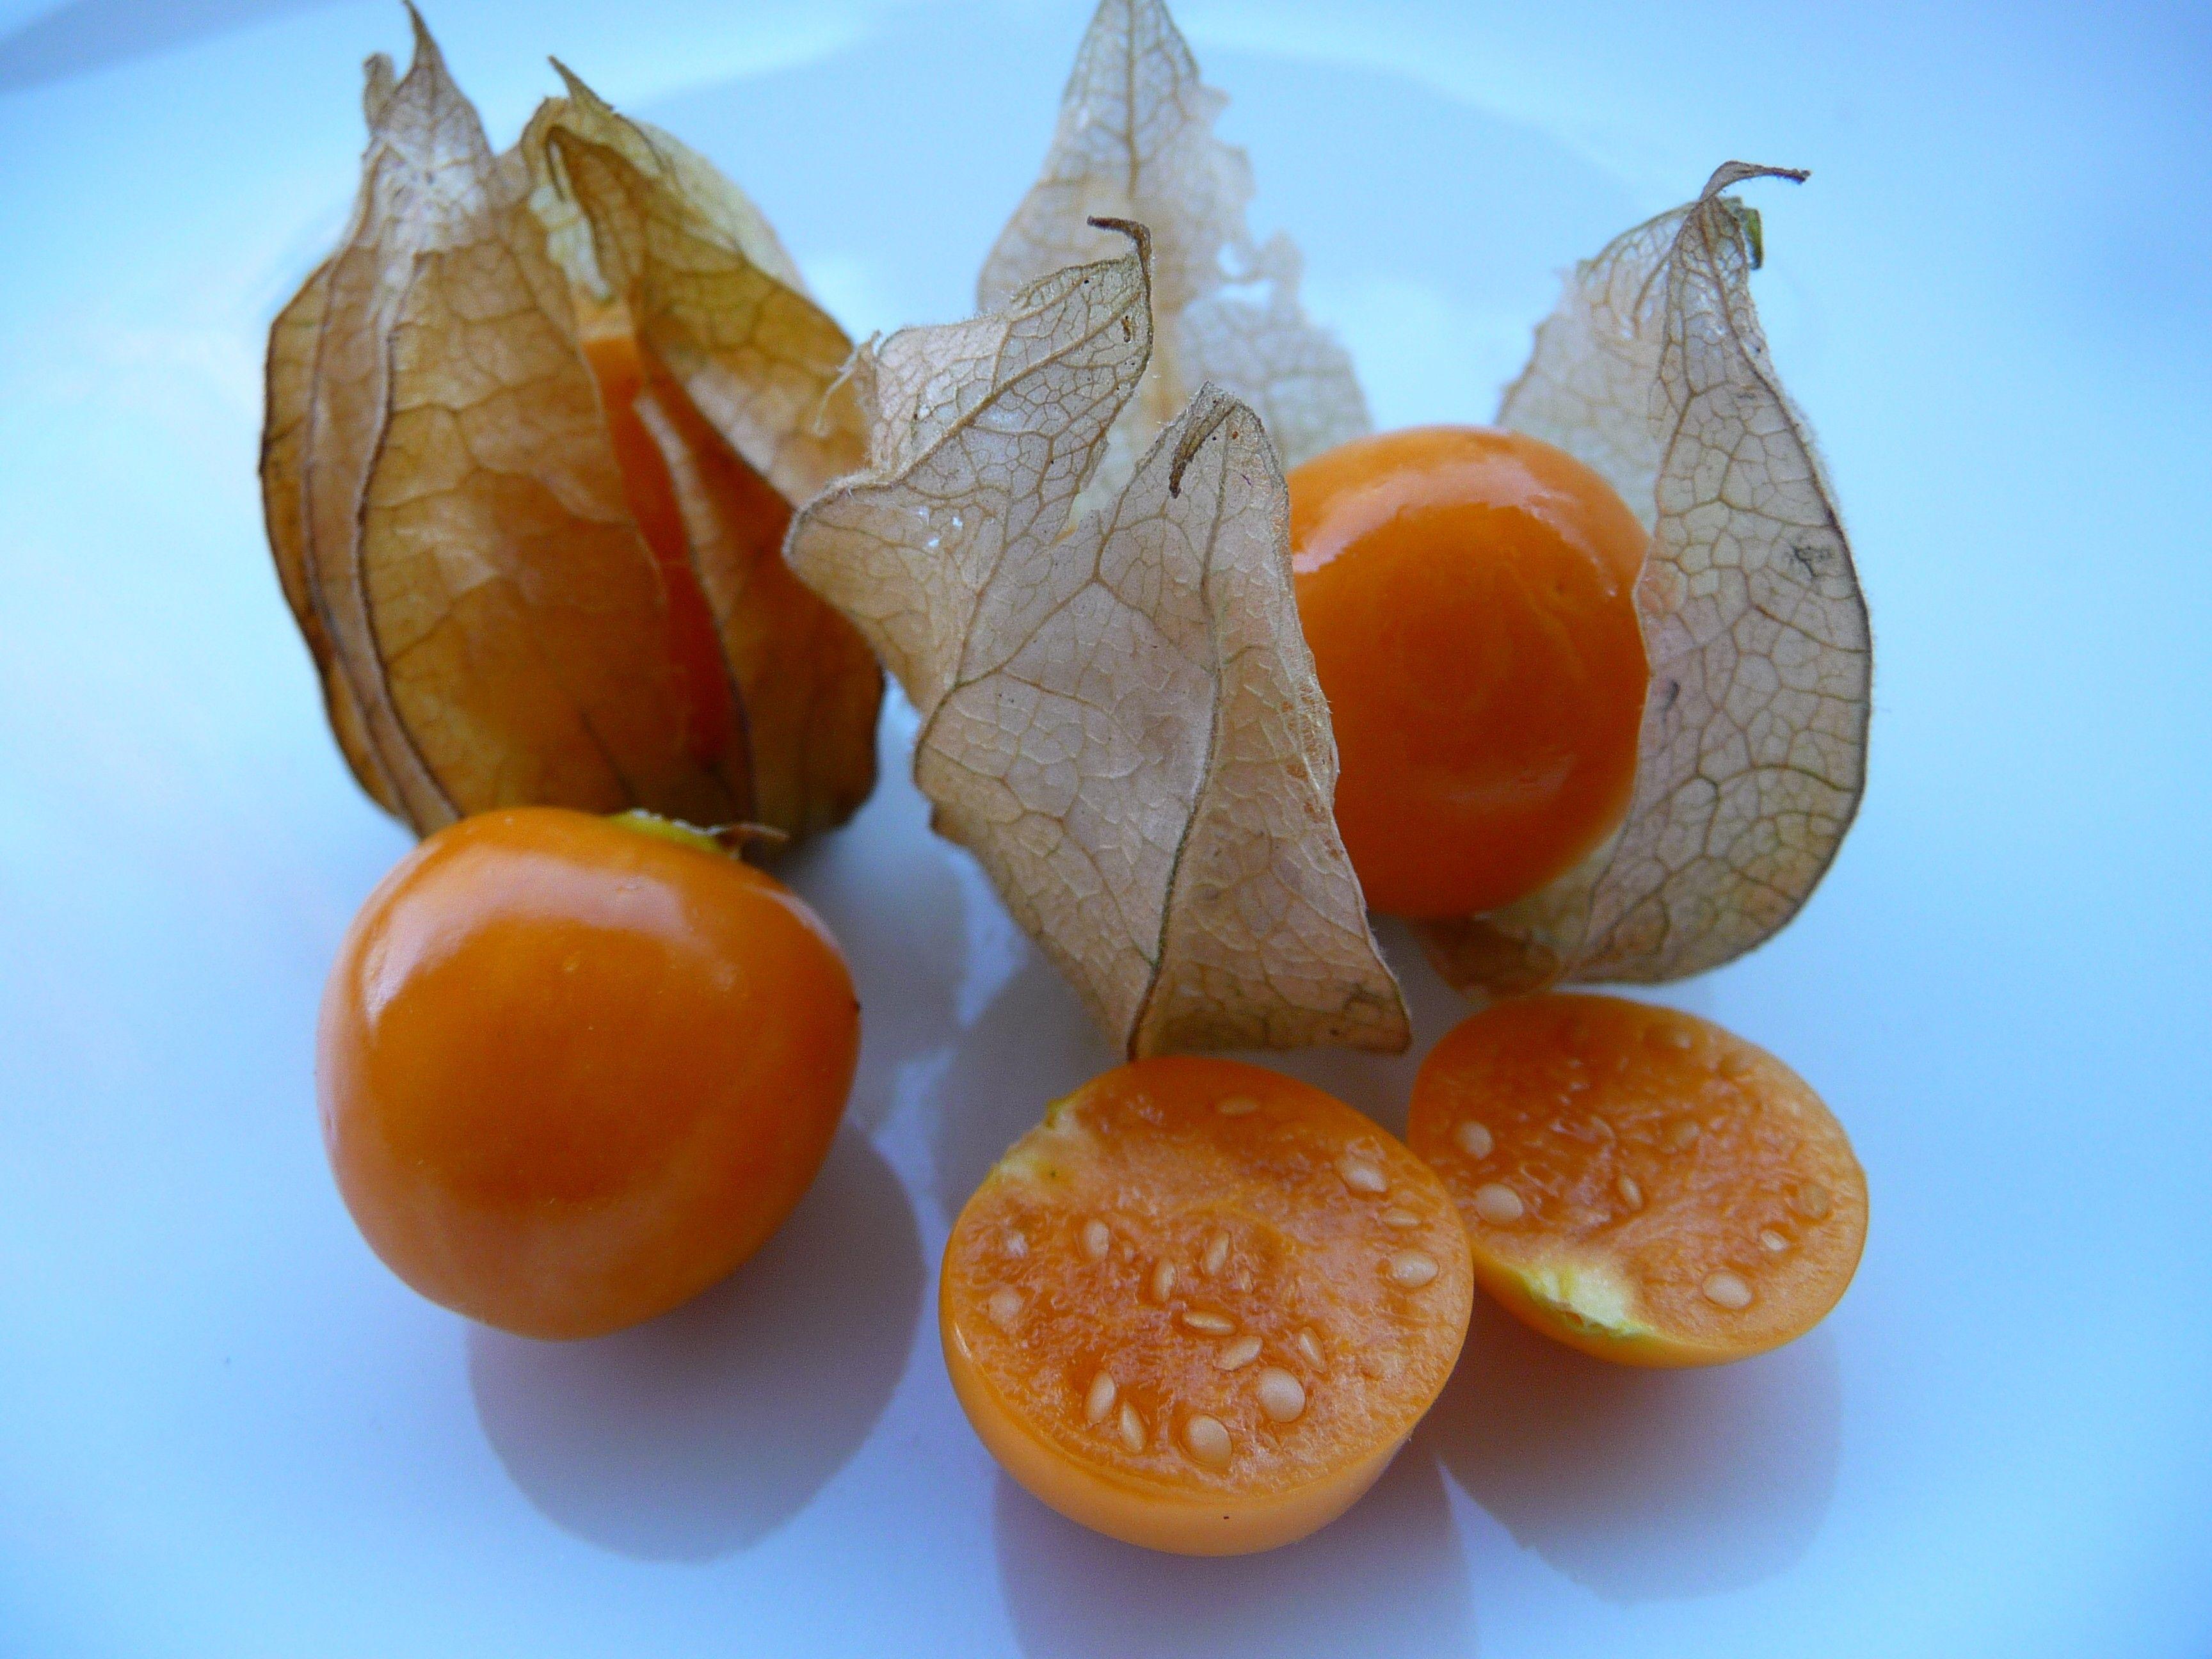 فوائد الحرنكش للرجال والسيدات فوائد الحرنكش للشعر فوائد الحرنكش للتخسيس Cape Gooseberry Fruit Benefits Physalis